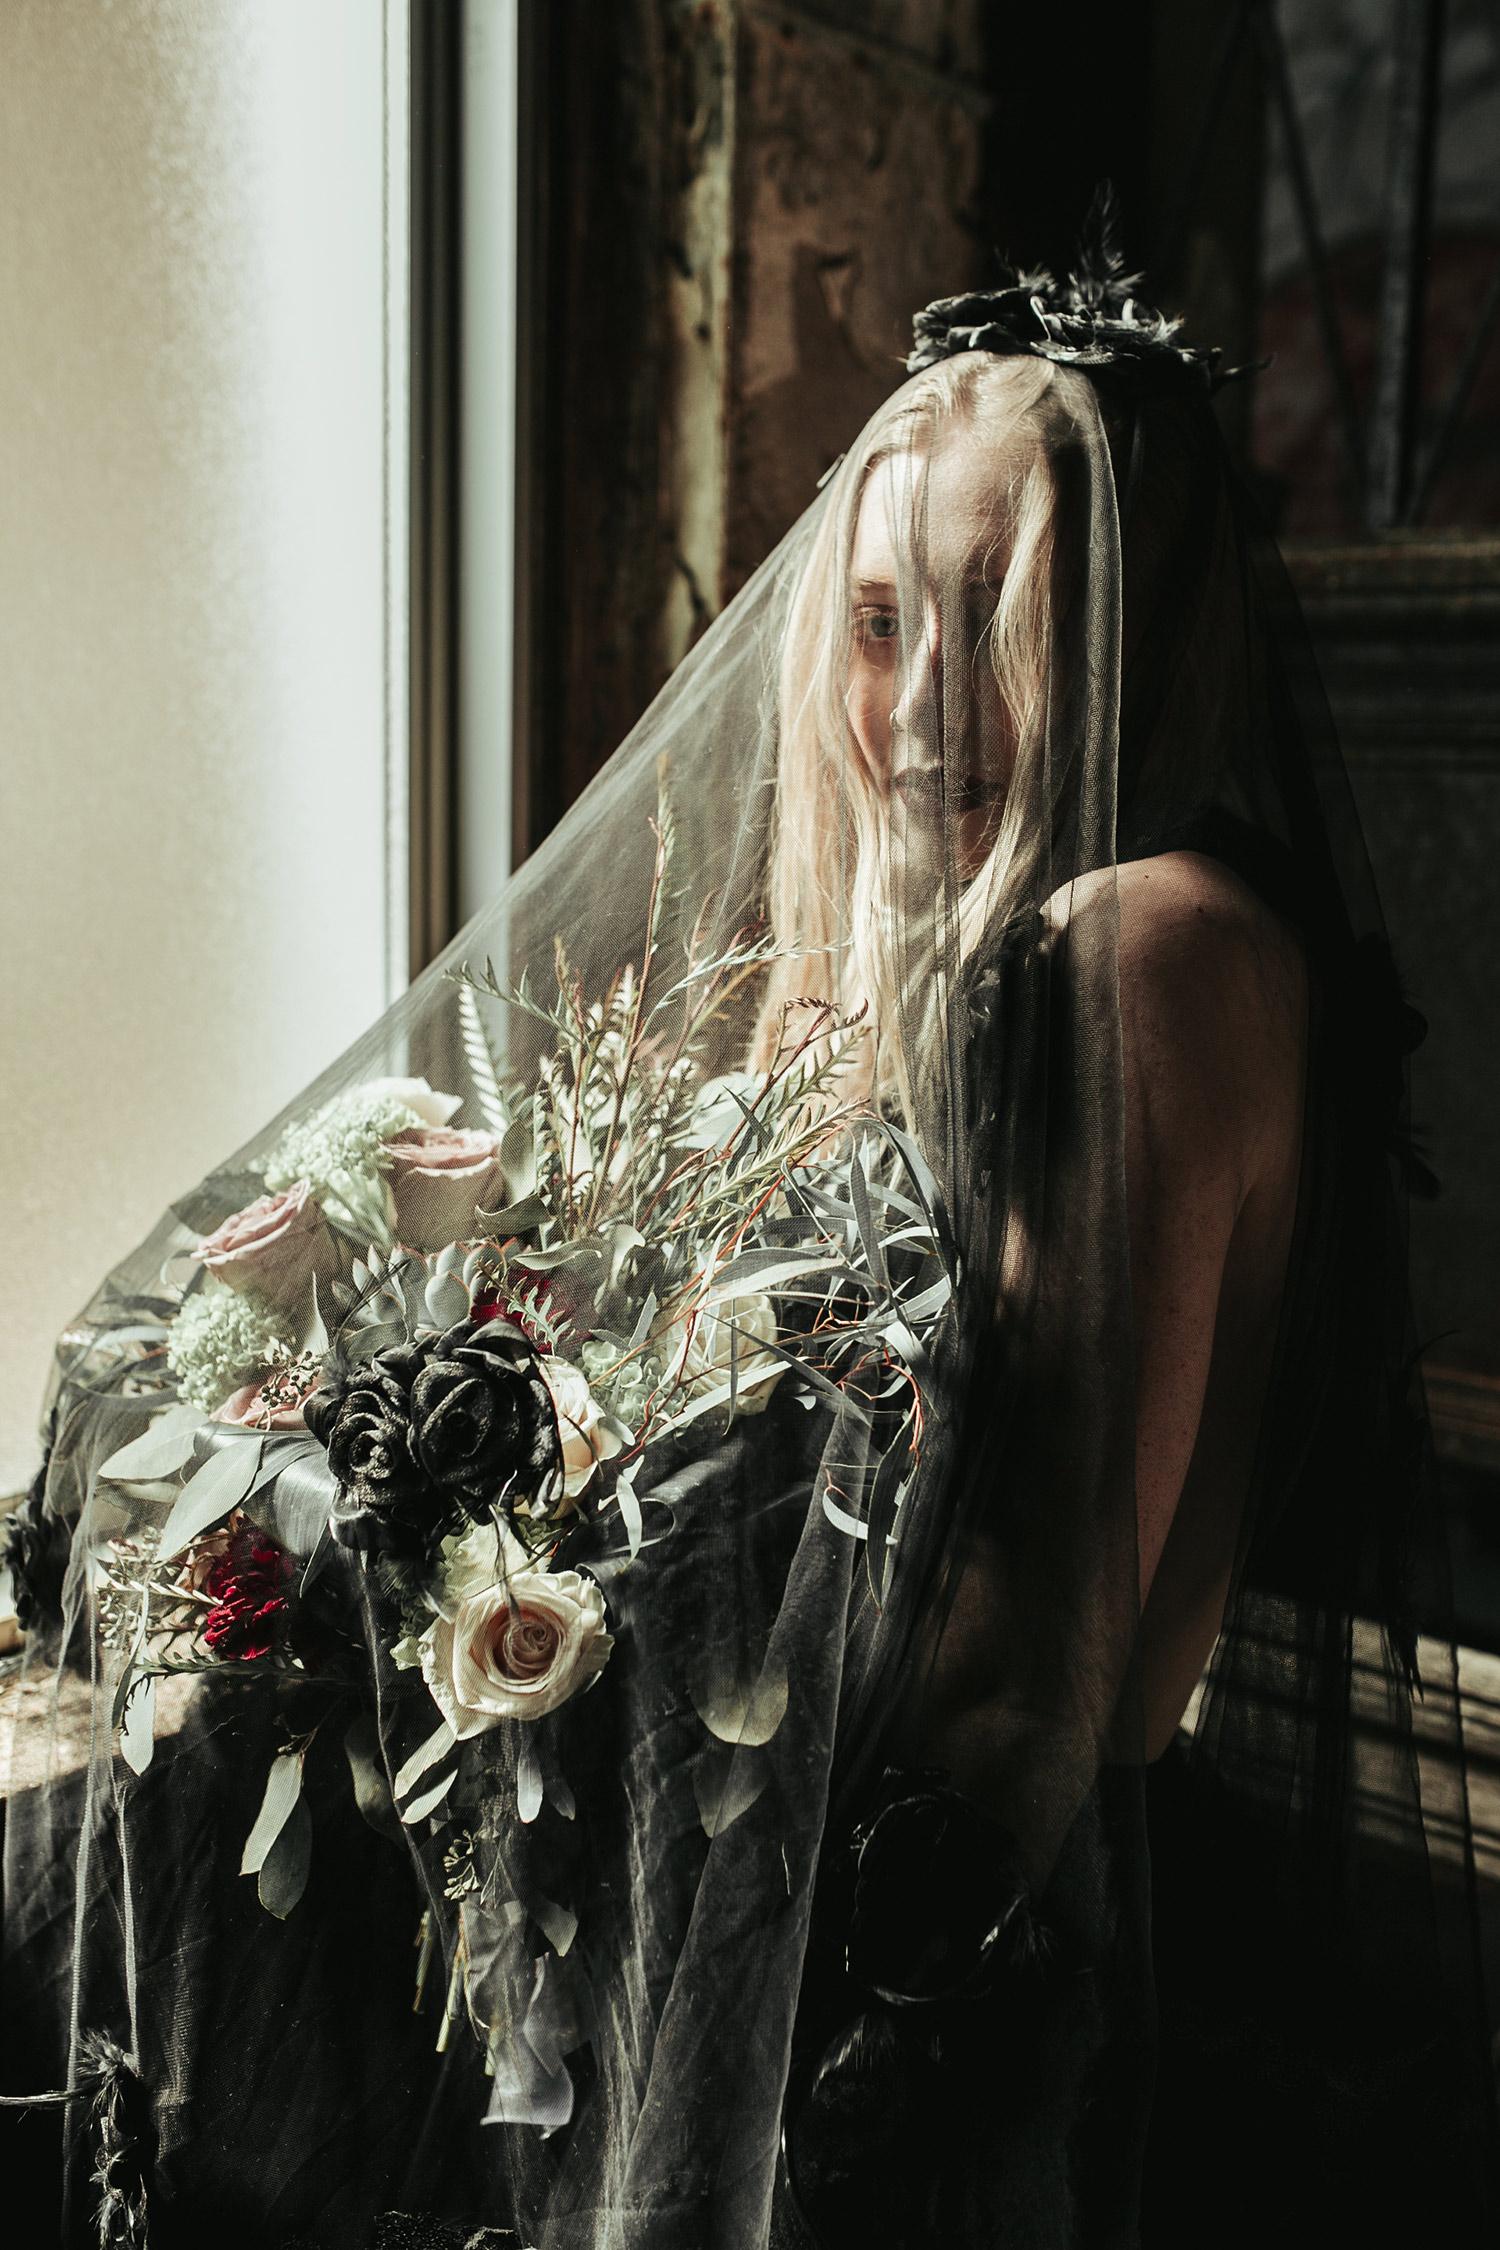 bride-holding-flowers-under-black-veil-black-dress-burlington-iowa-gothic-wedding-elopement-raelyn-ramey-photography-113.jpg